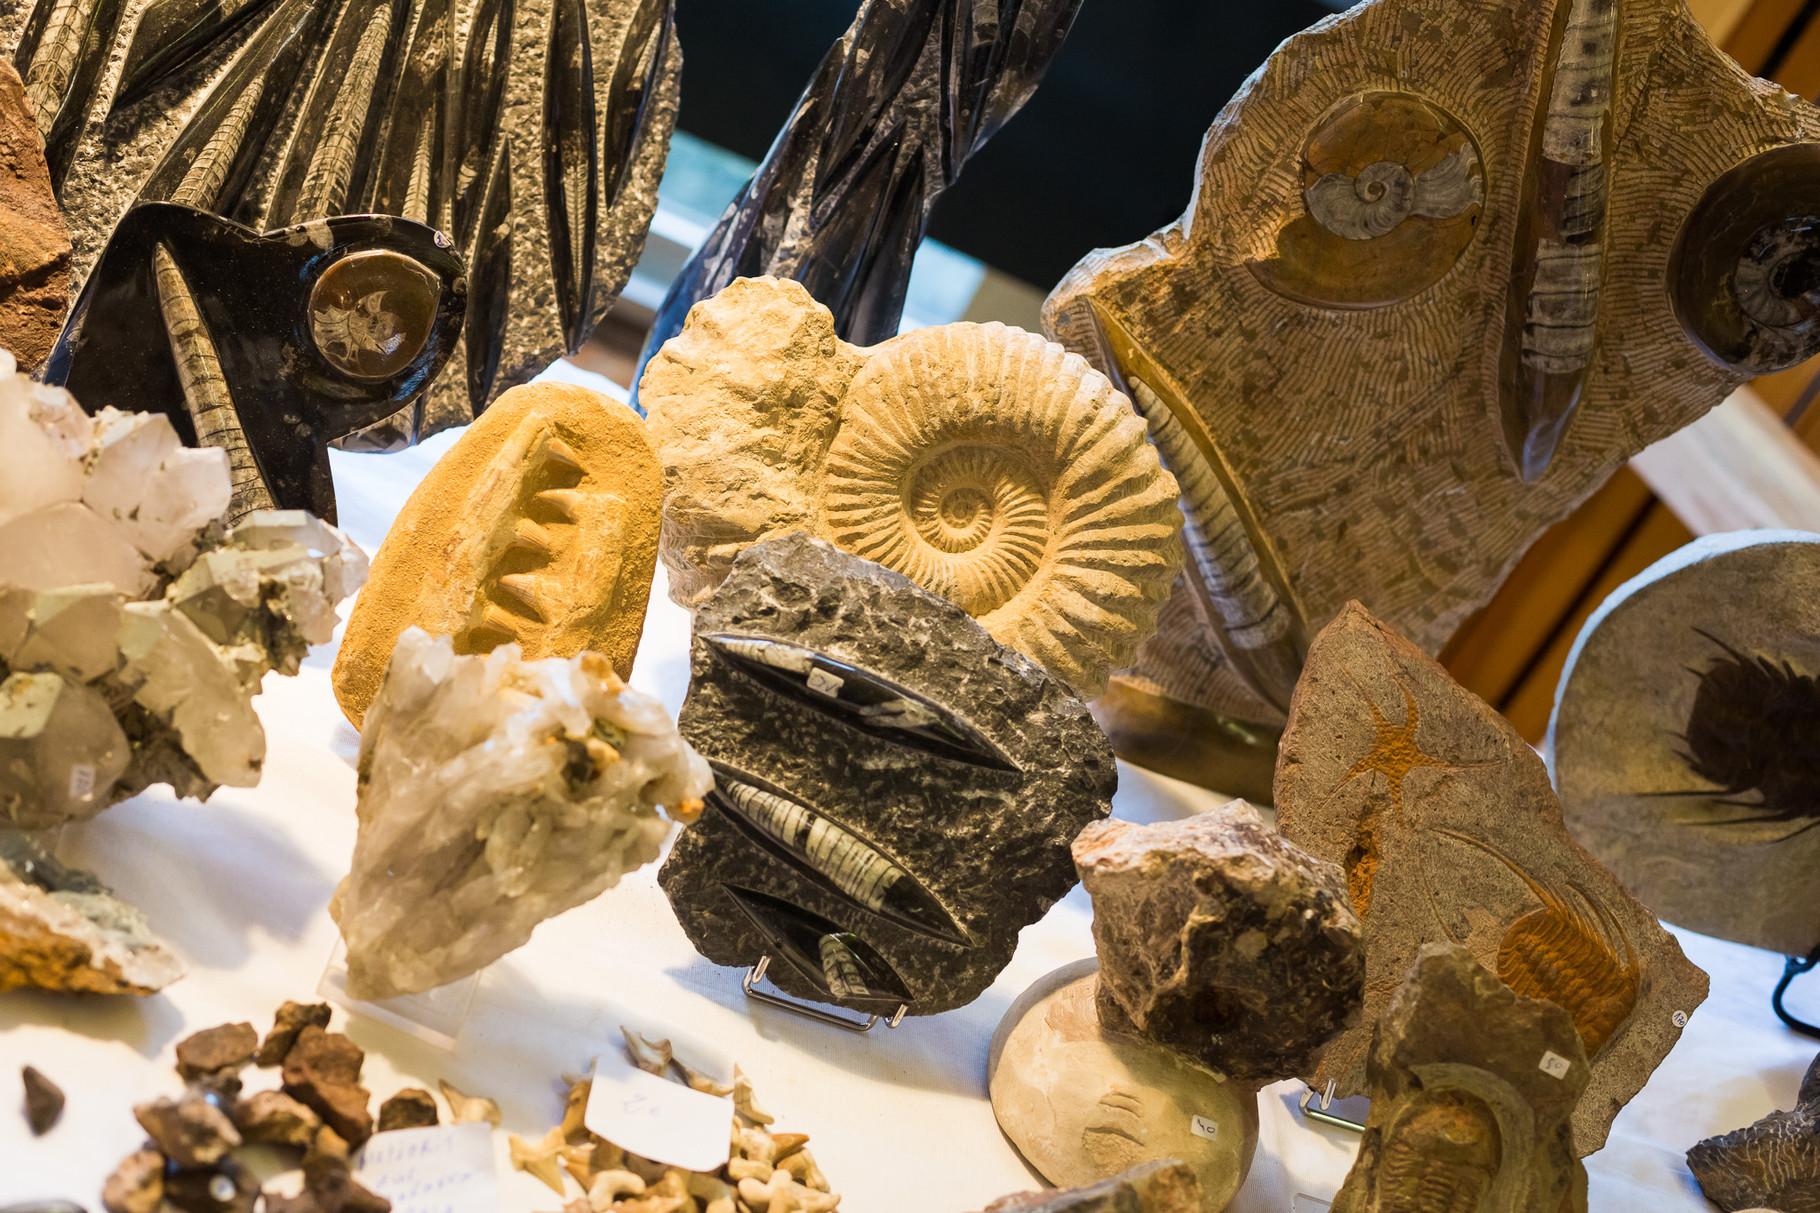 Verschiedene Fossilien